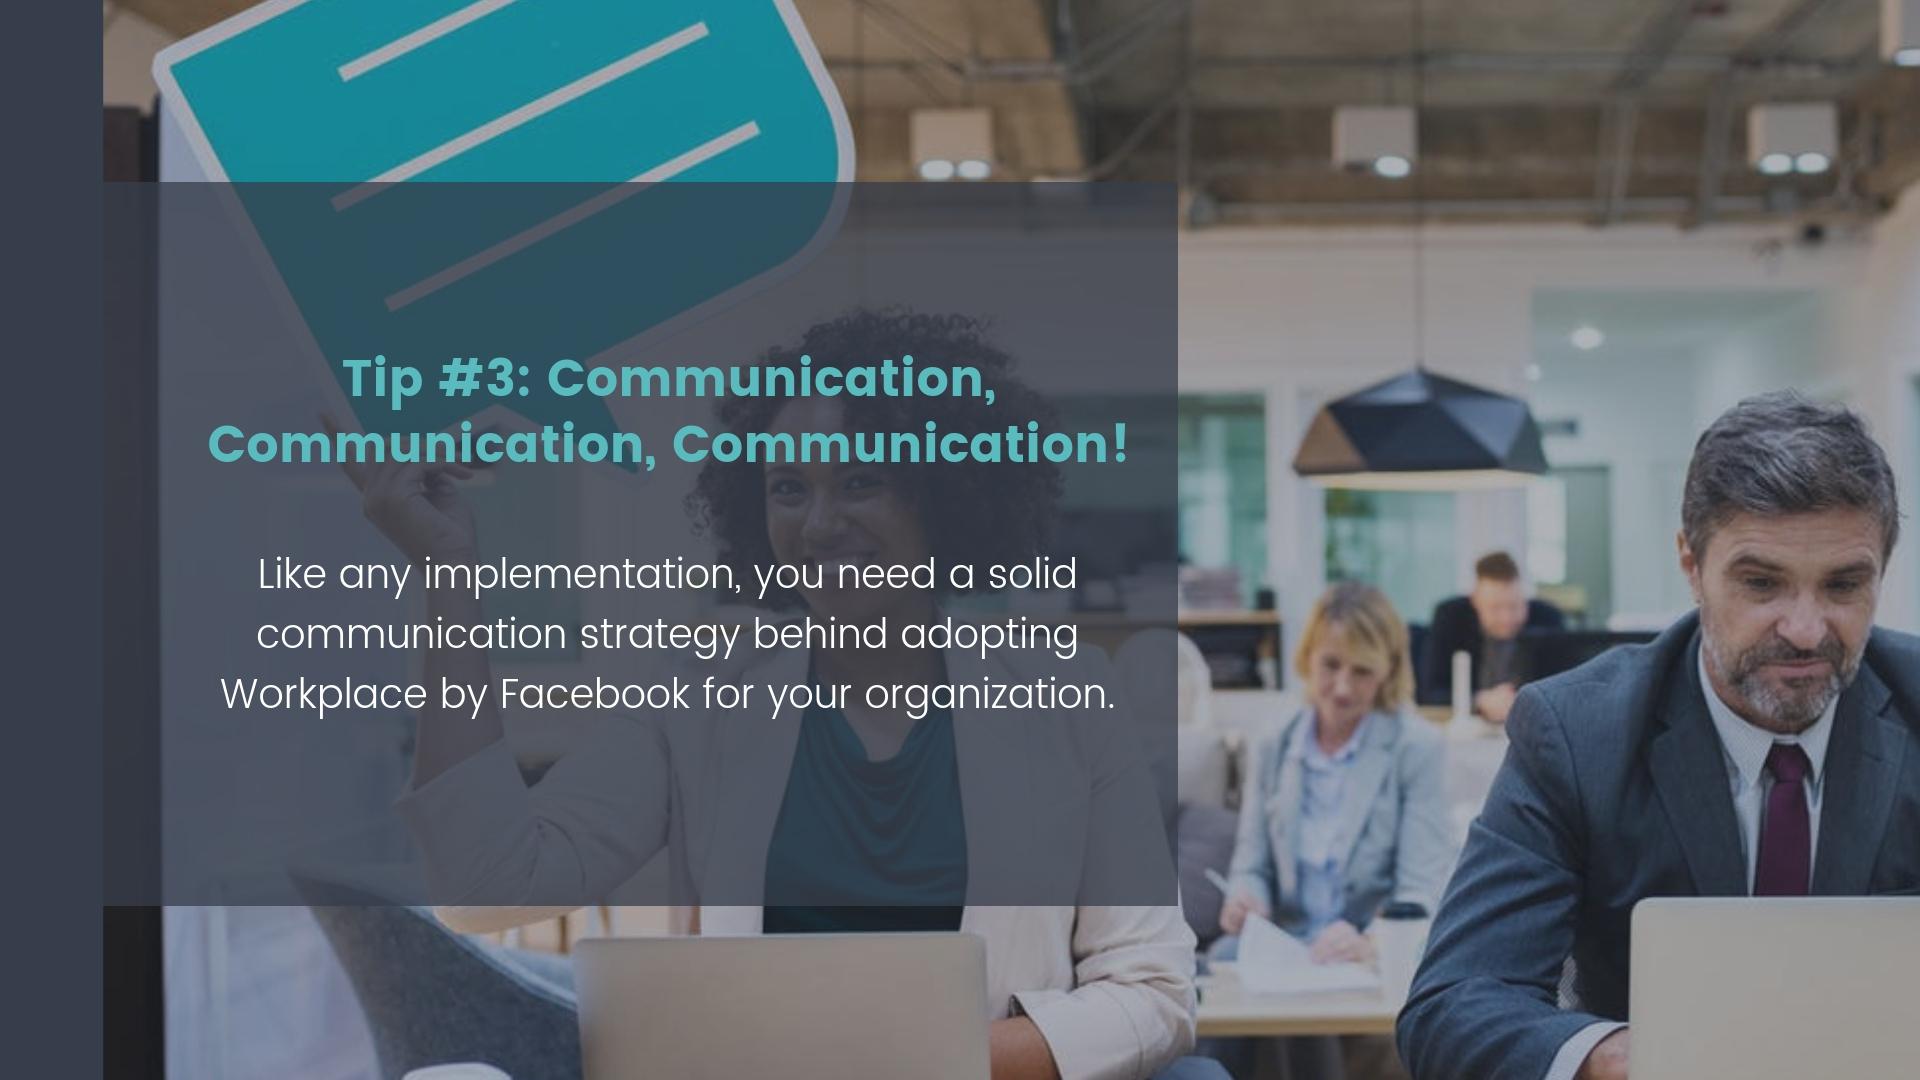 Tip #3: Communication, Communication, Communication! Tip Number 3